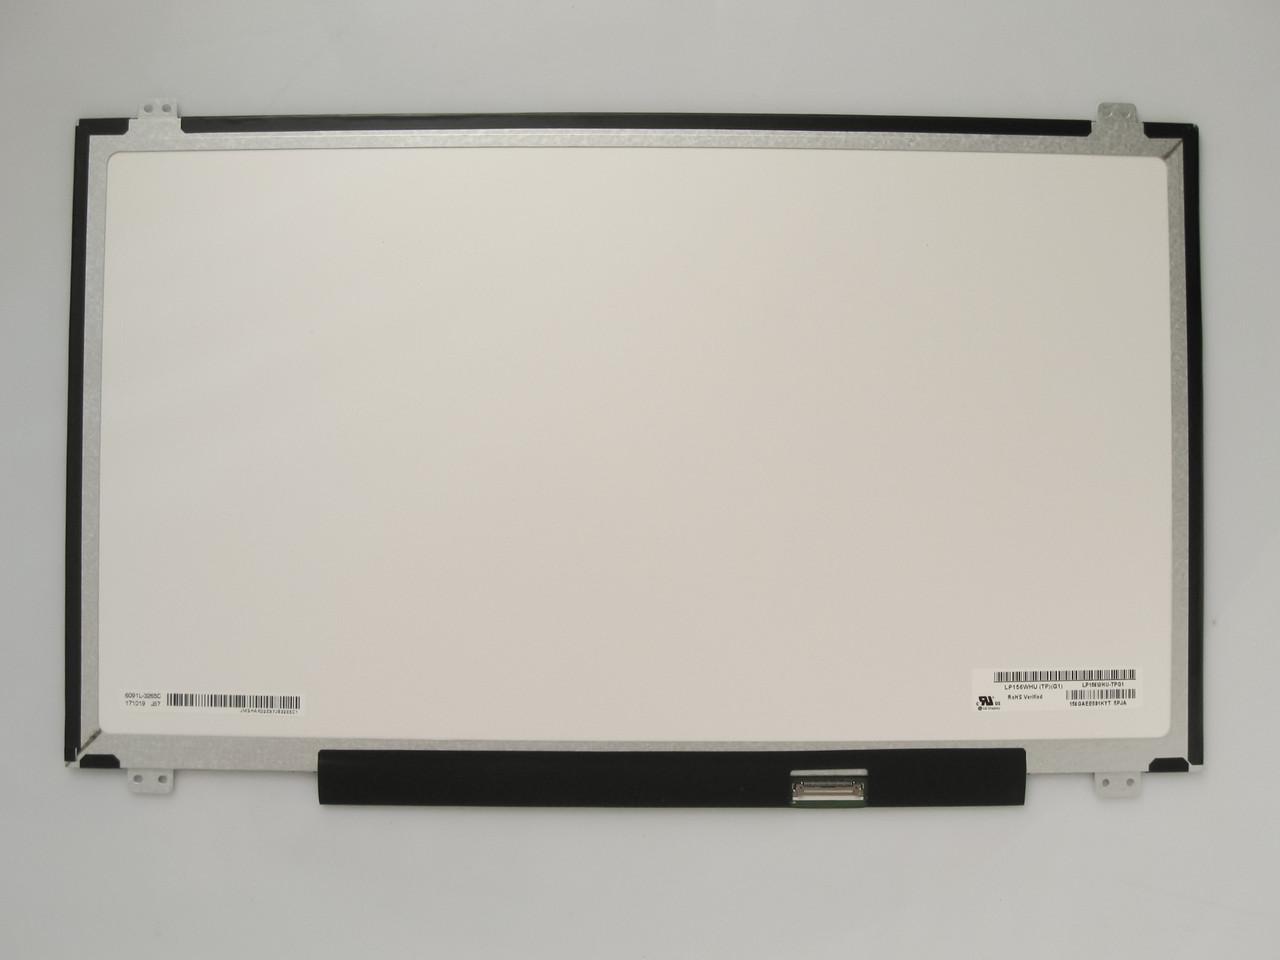 Матрица для ноутбука 15.6 Led Slim глянцевая 1366x768 30pin lvds разъем справа внизу (со стороны платы) нов